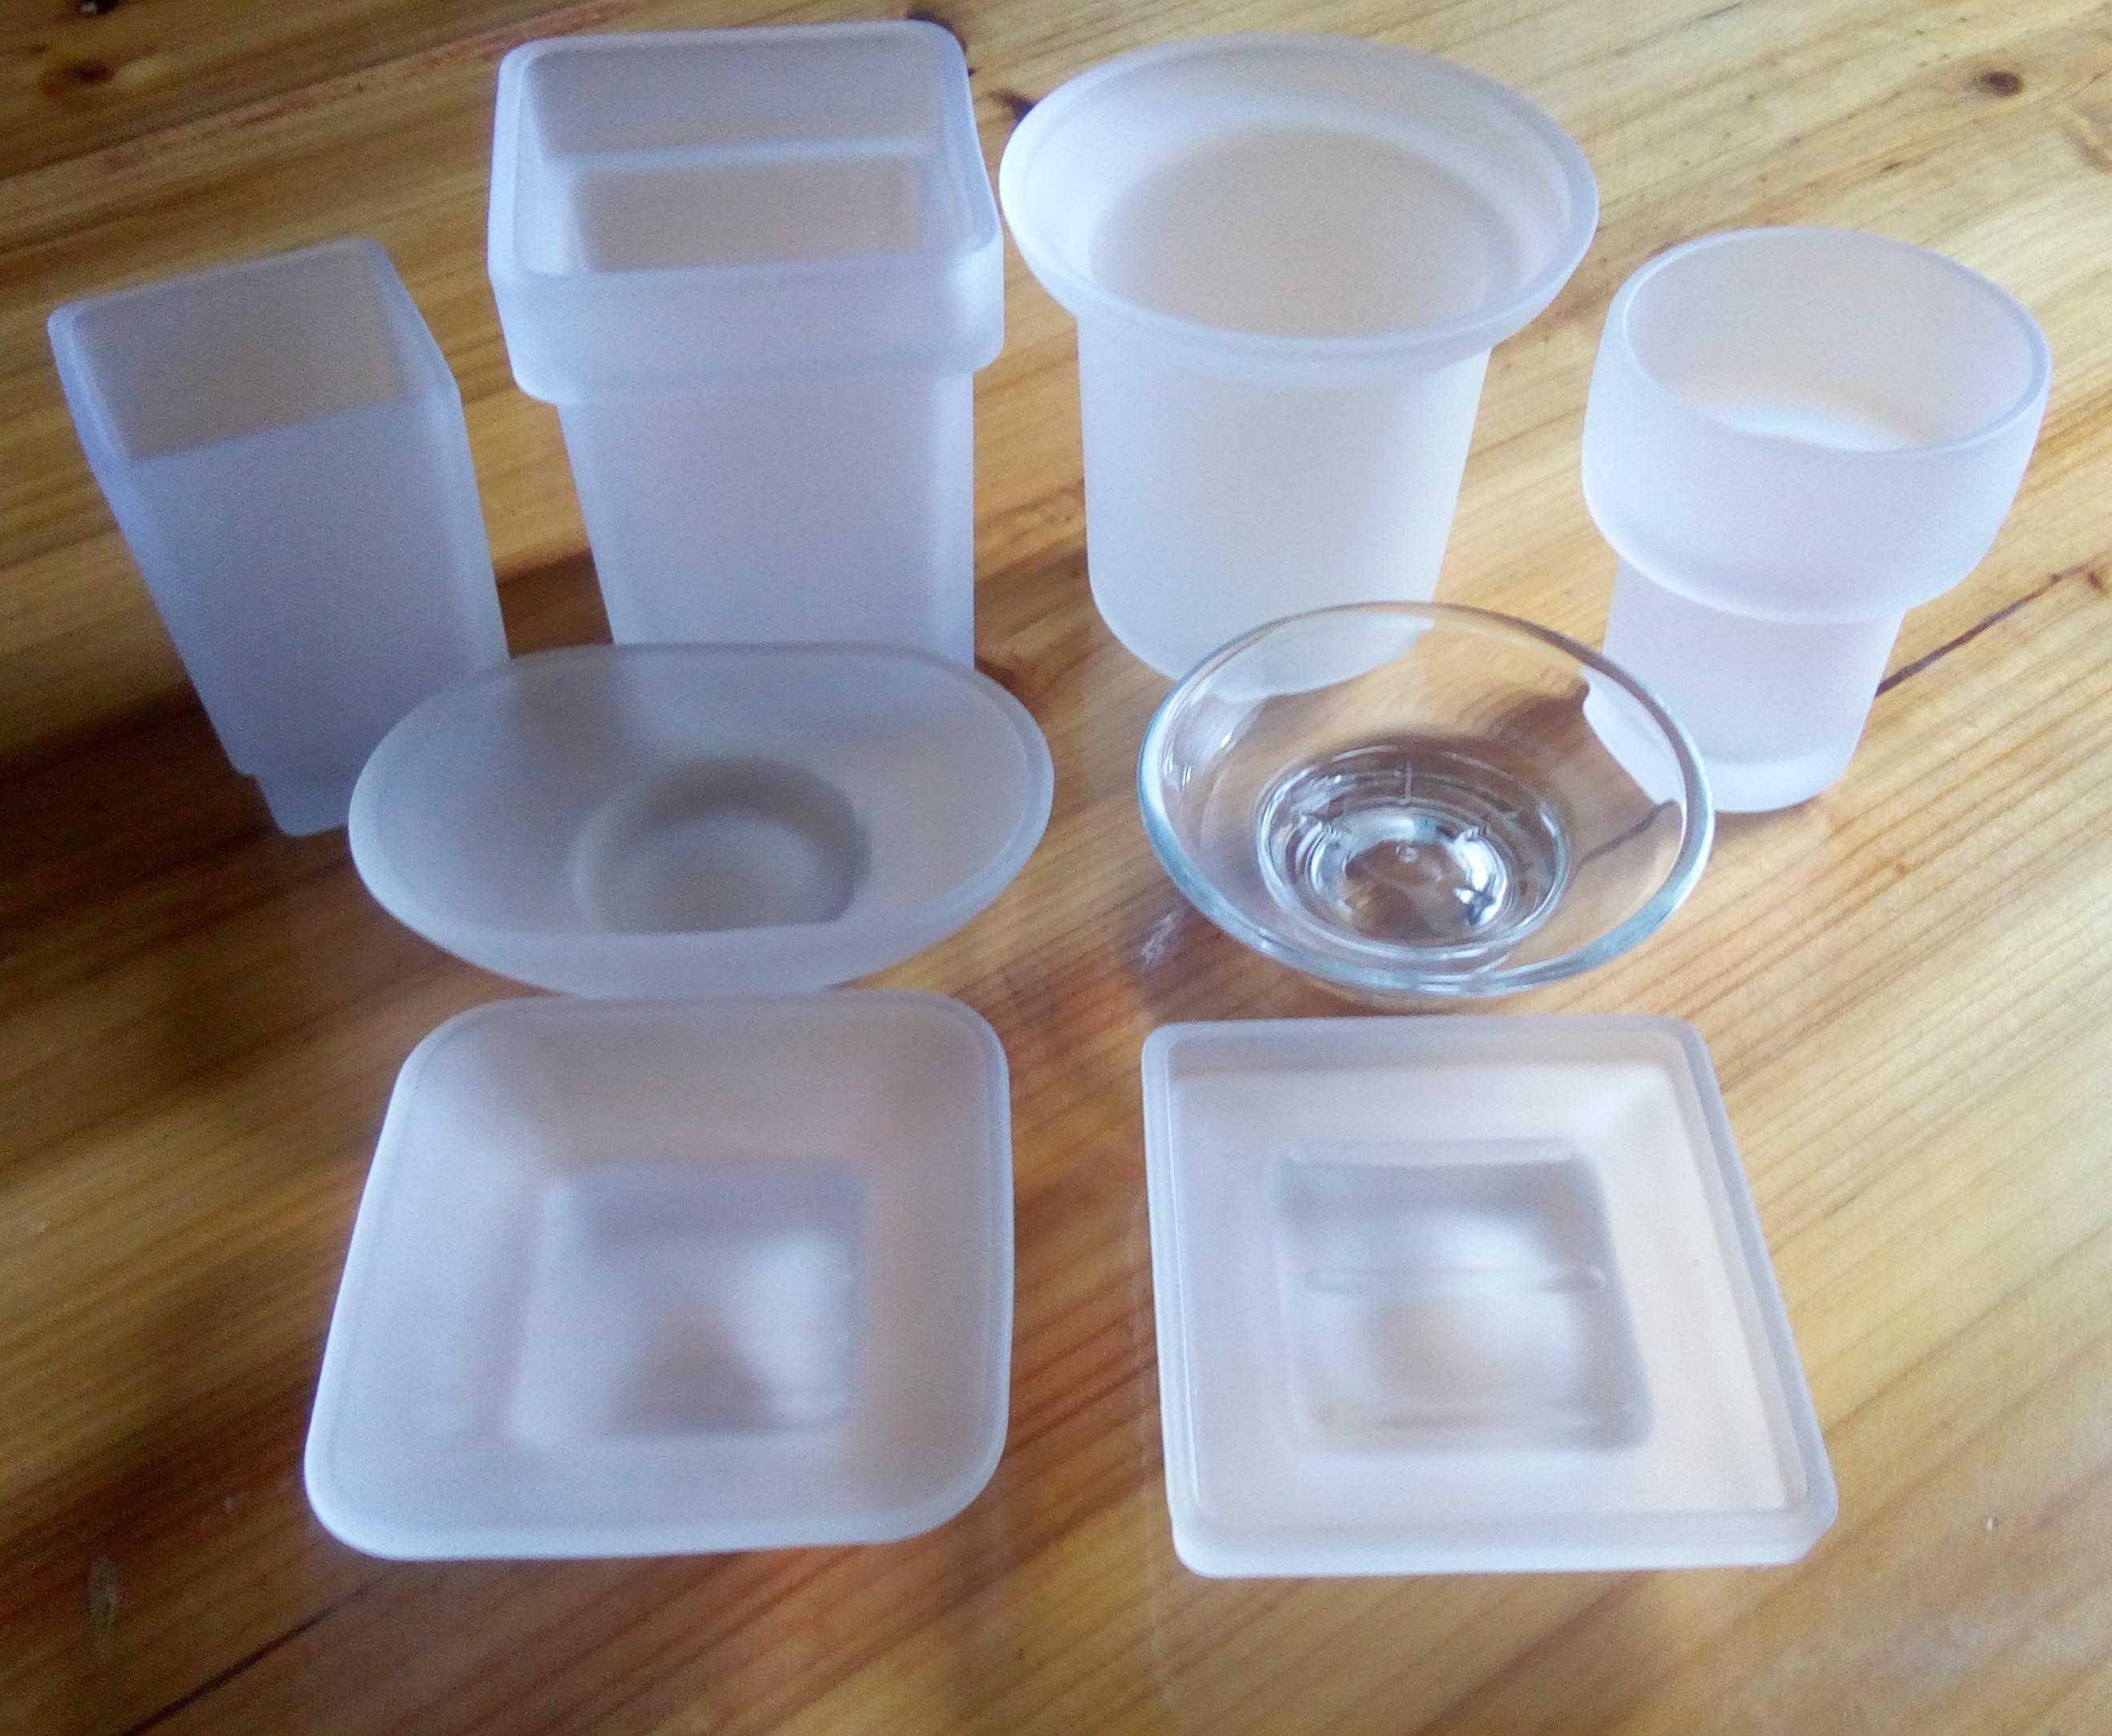 Glass Round / Square Soap Dish, Repair Parts